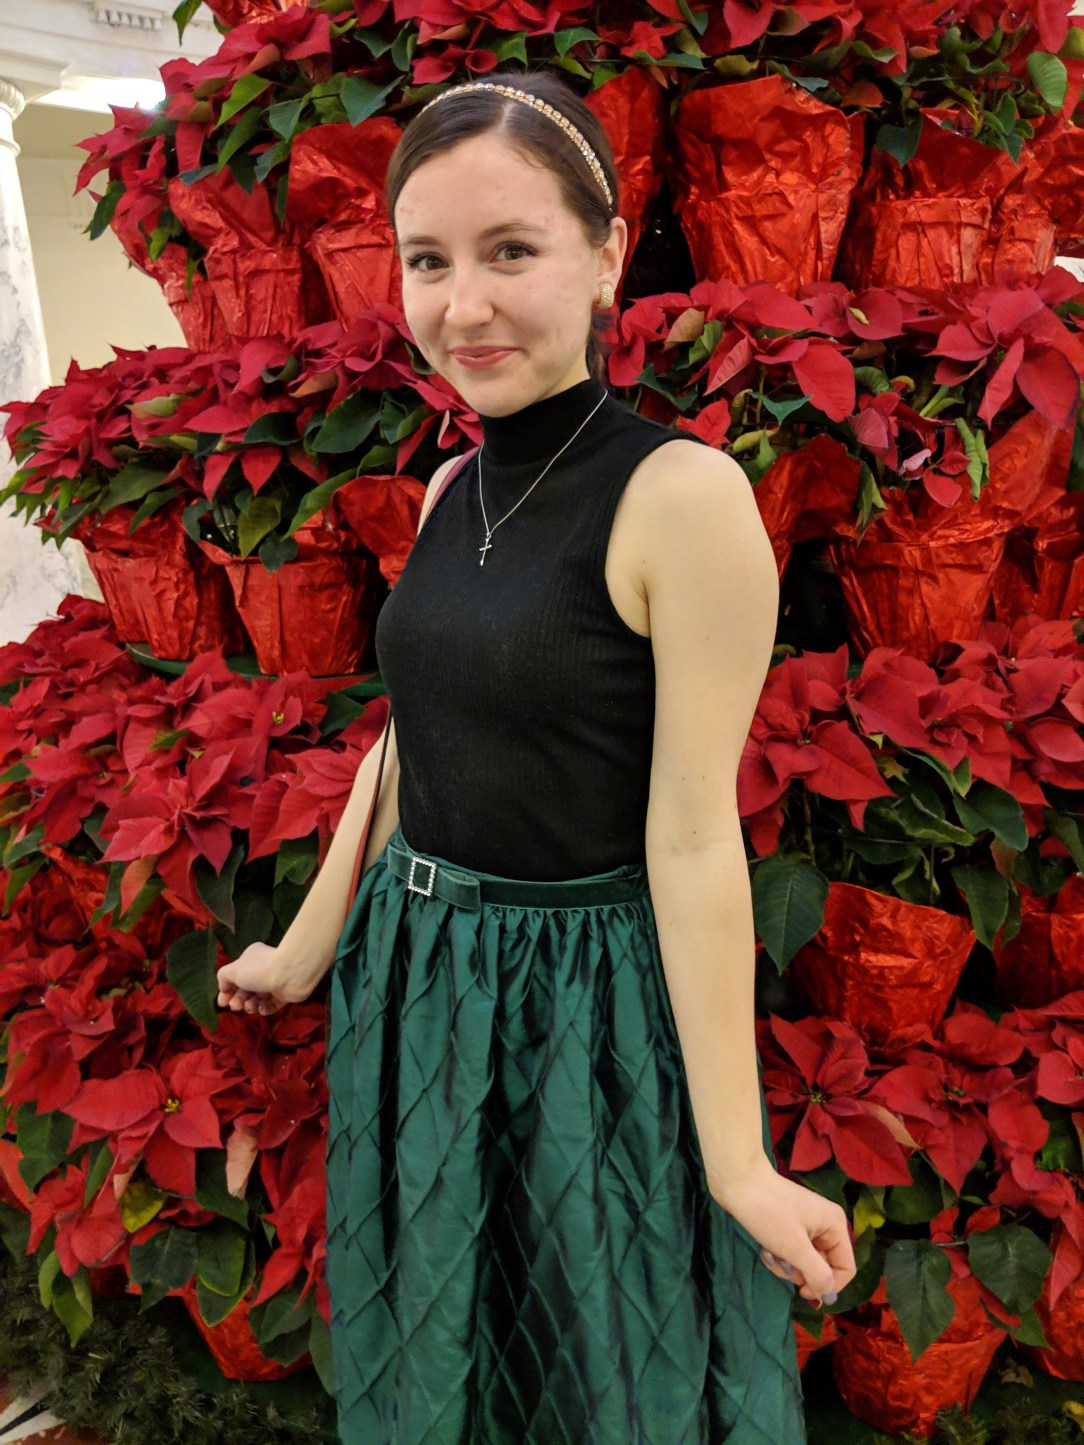 green Christmas dress turned into a skirt